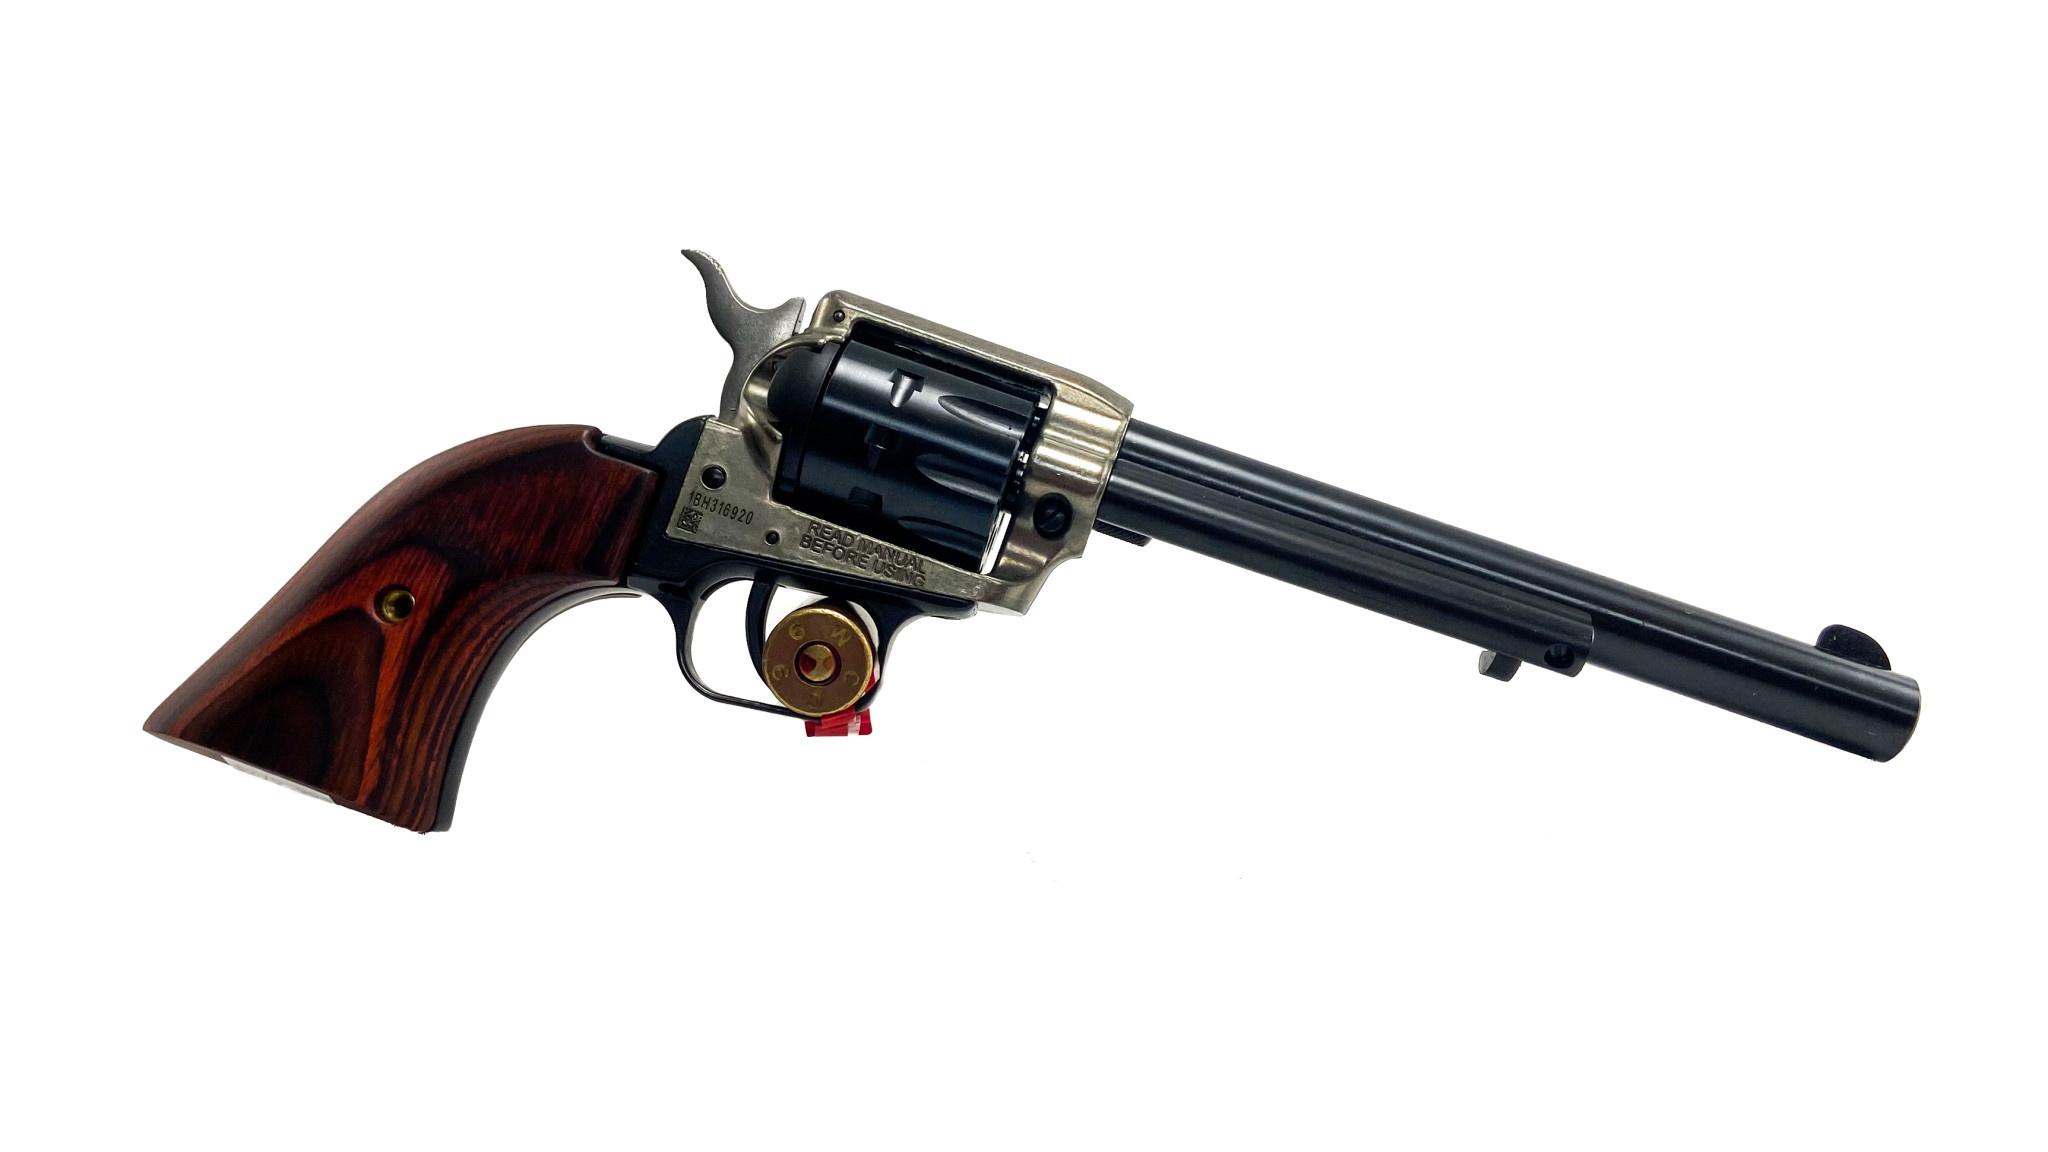 "Heritage Rough Rider 22lr 6 1/2"" barrel"